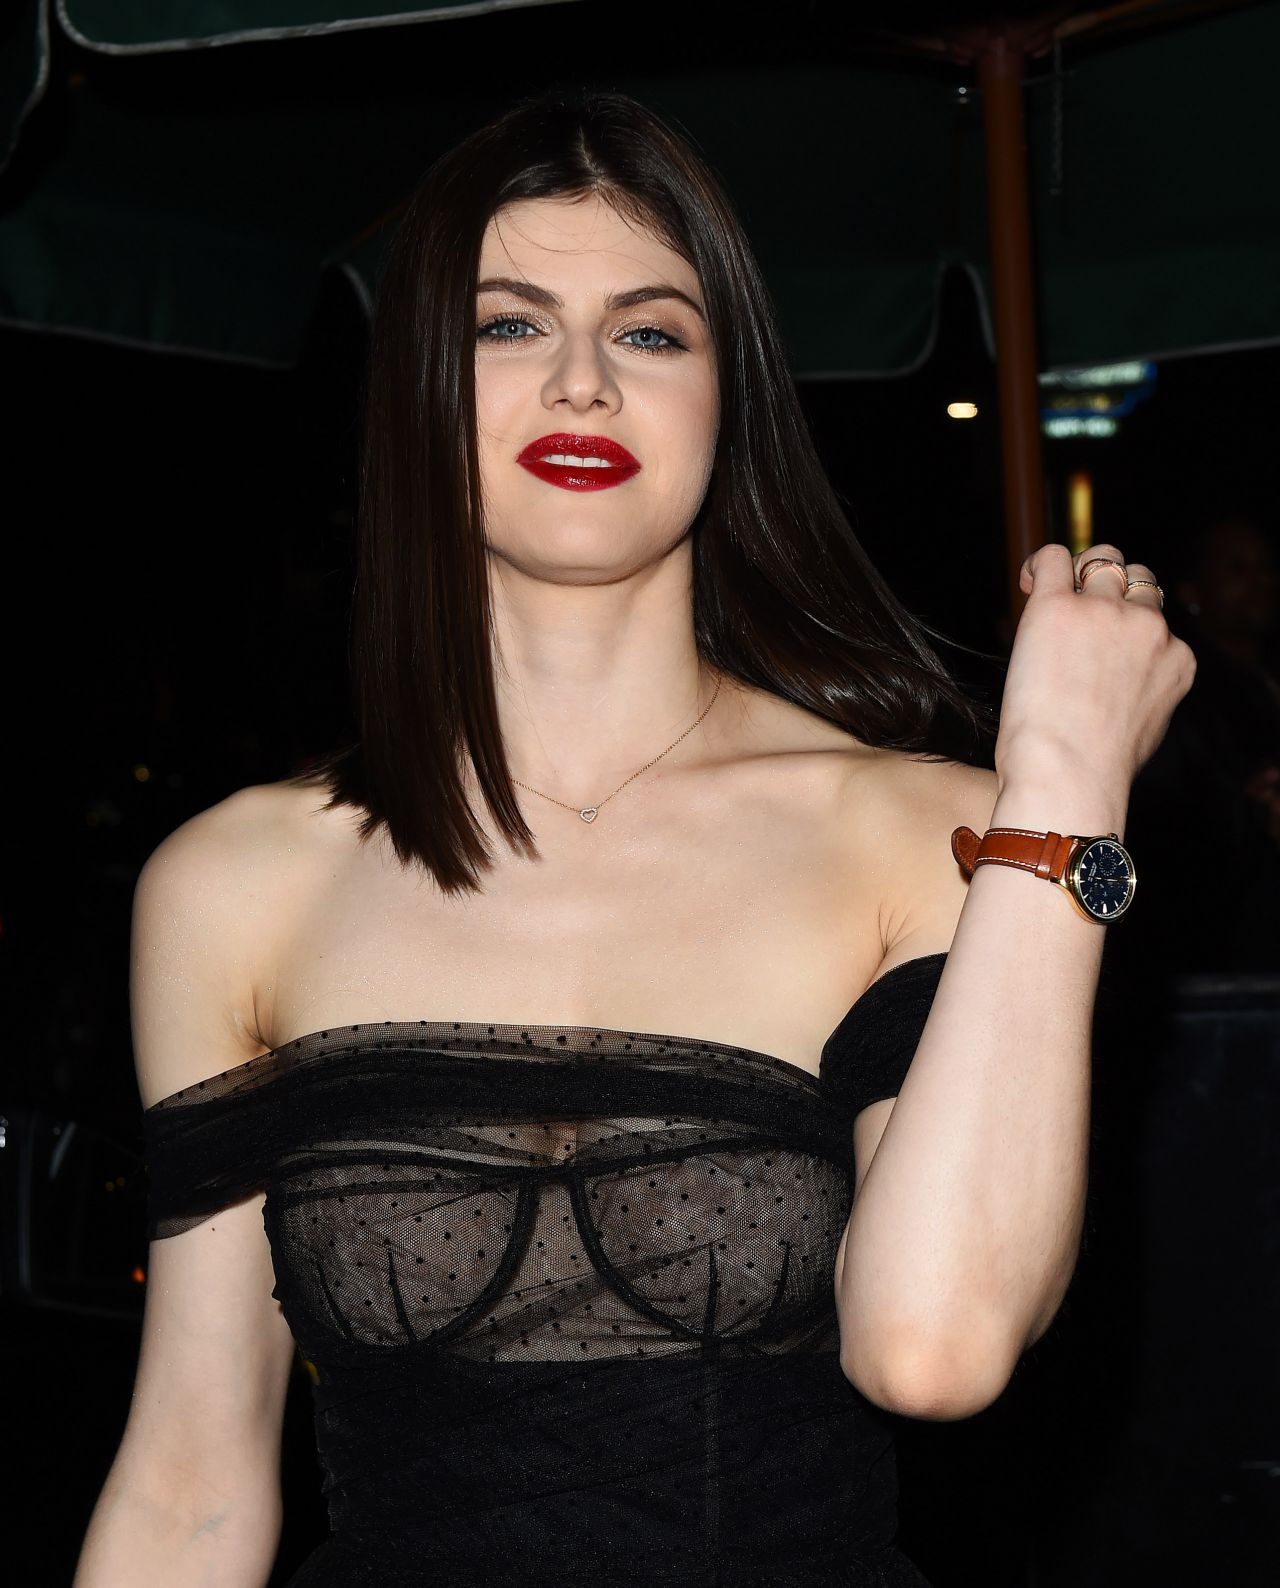 Alexandra daddario nipples